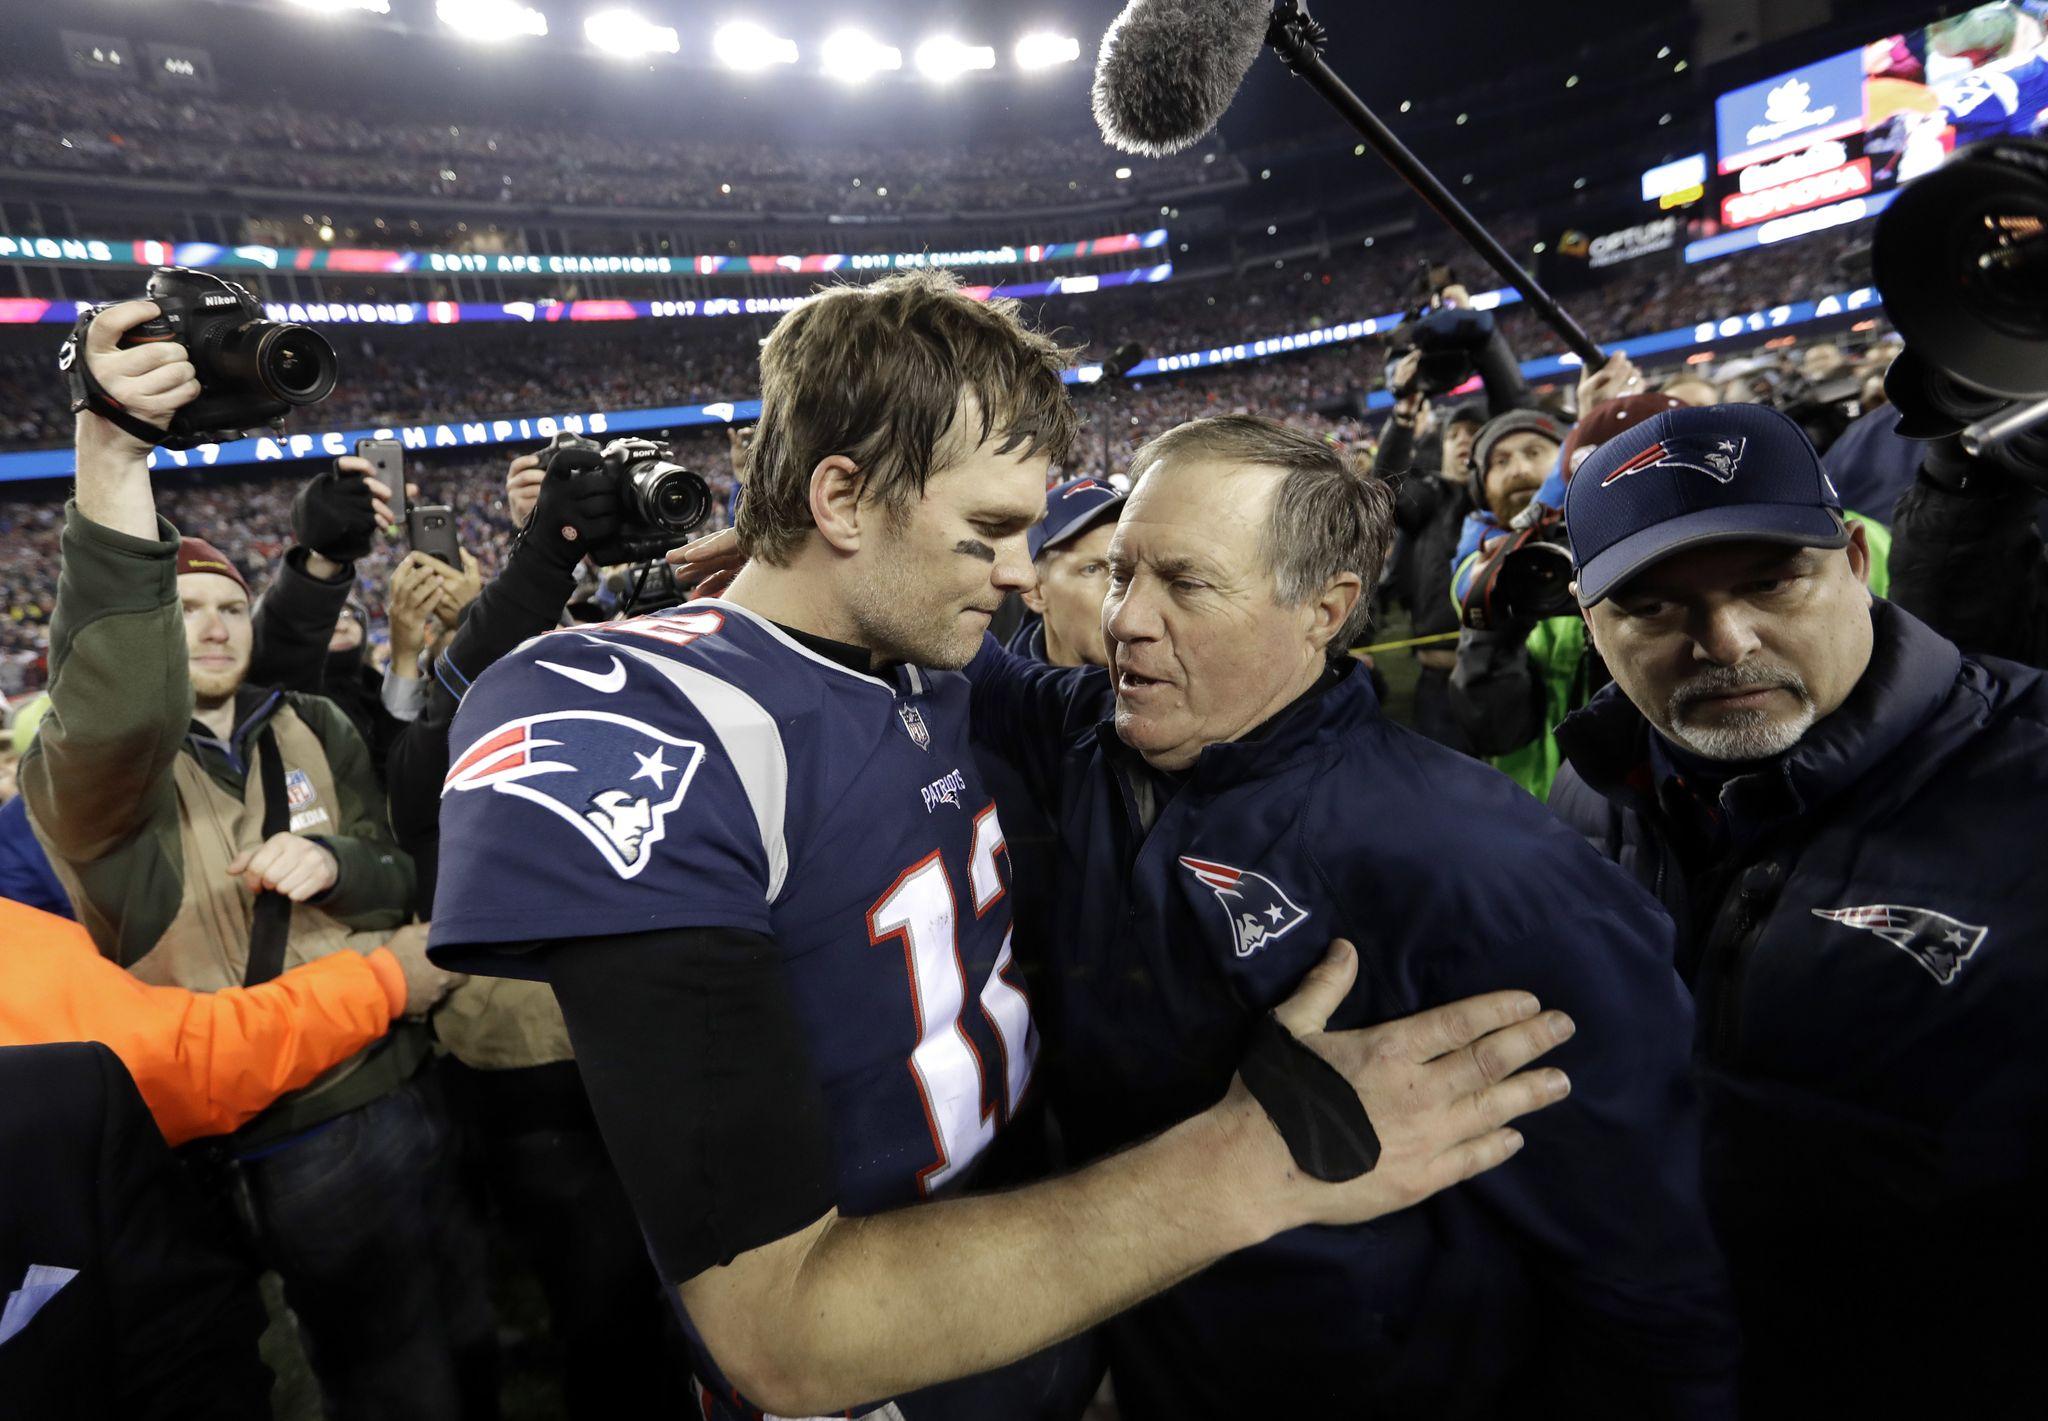 Tom Brady wanted 'divorce' from Bill Belichick: Book